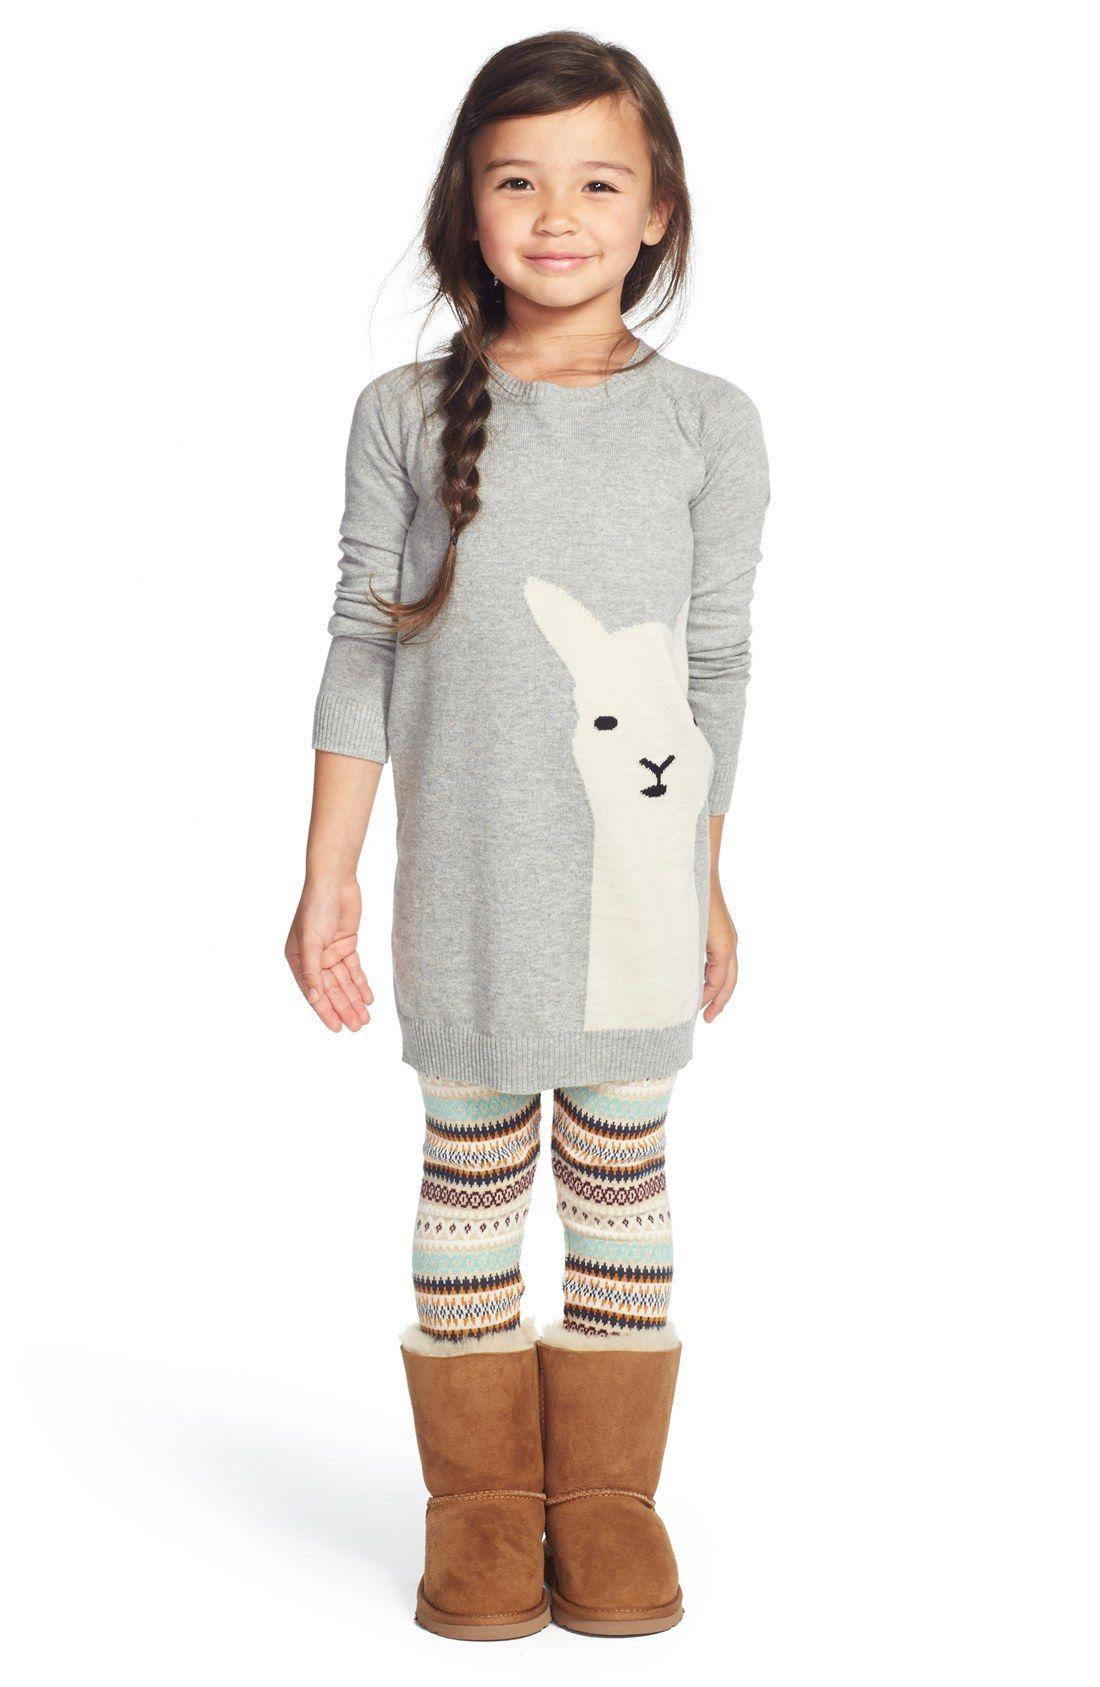 girls sweater dress and leggings